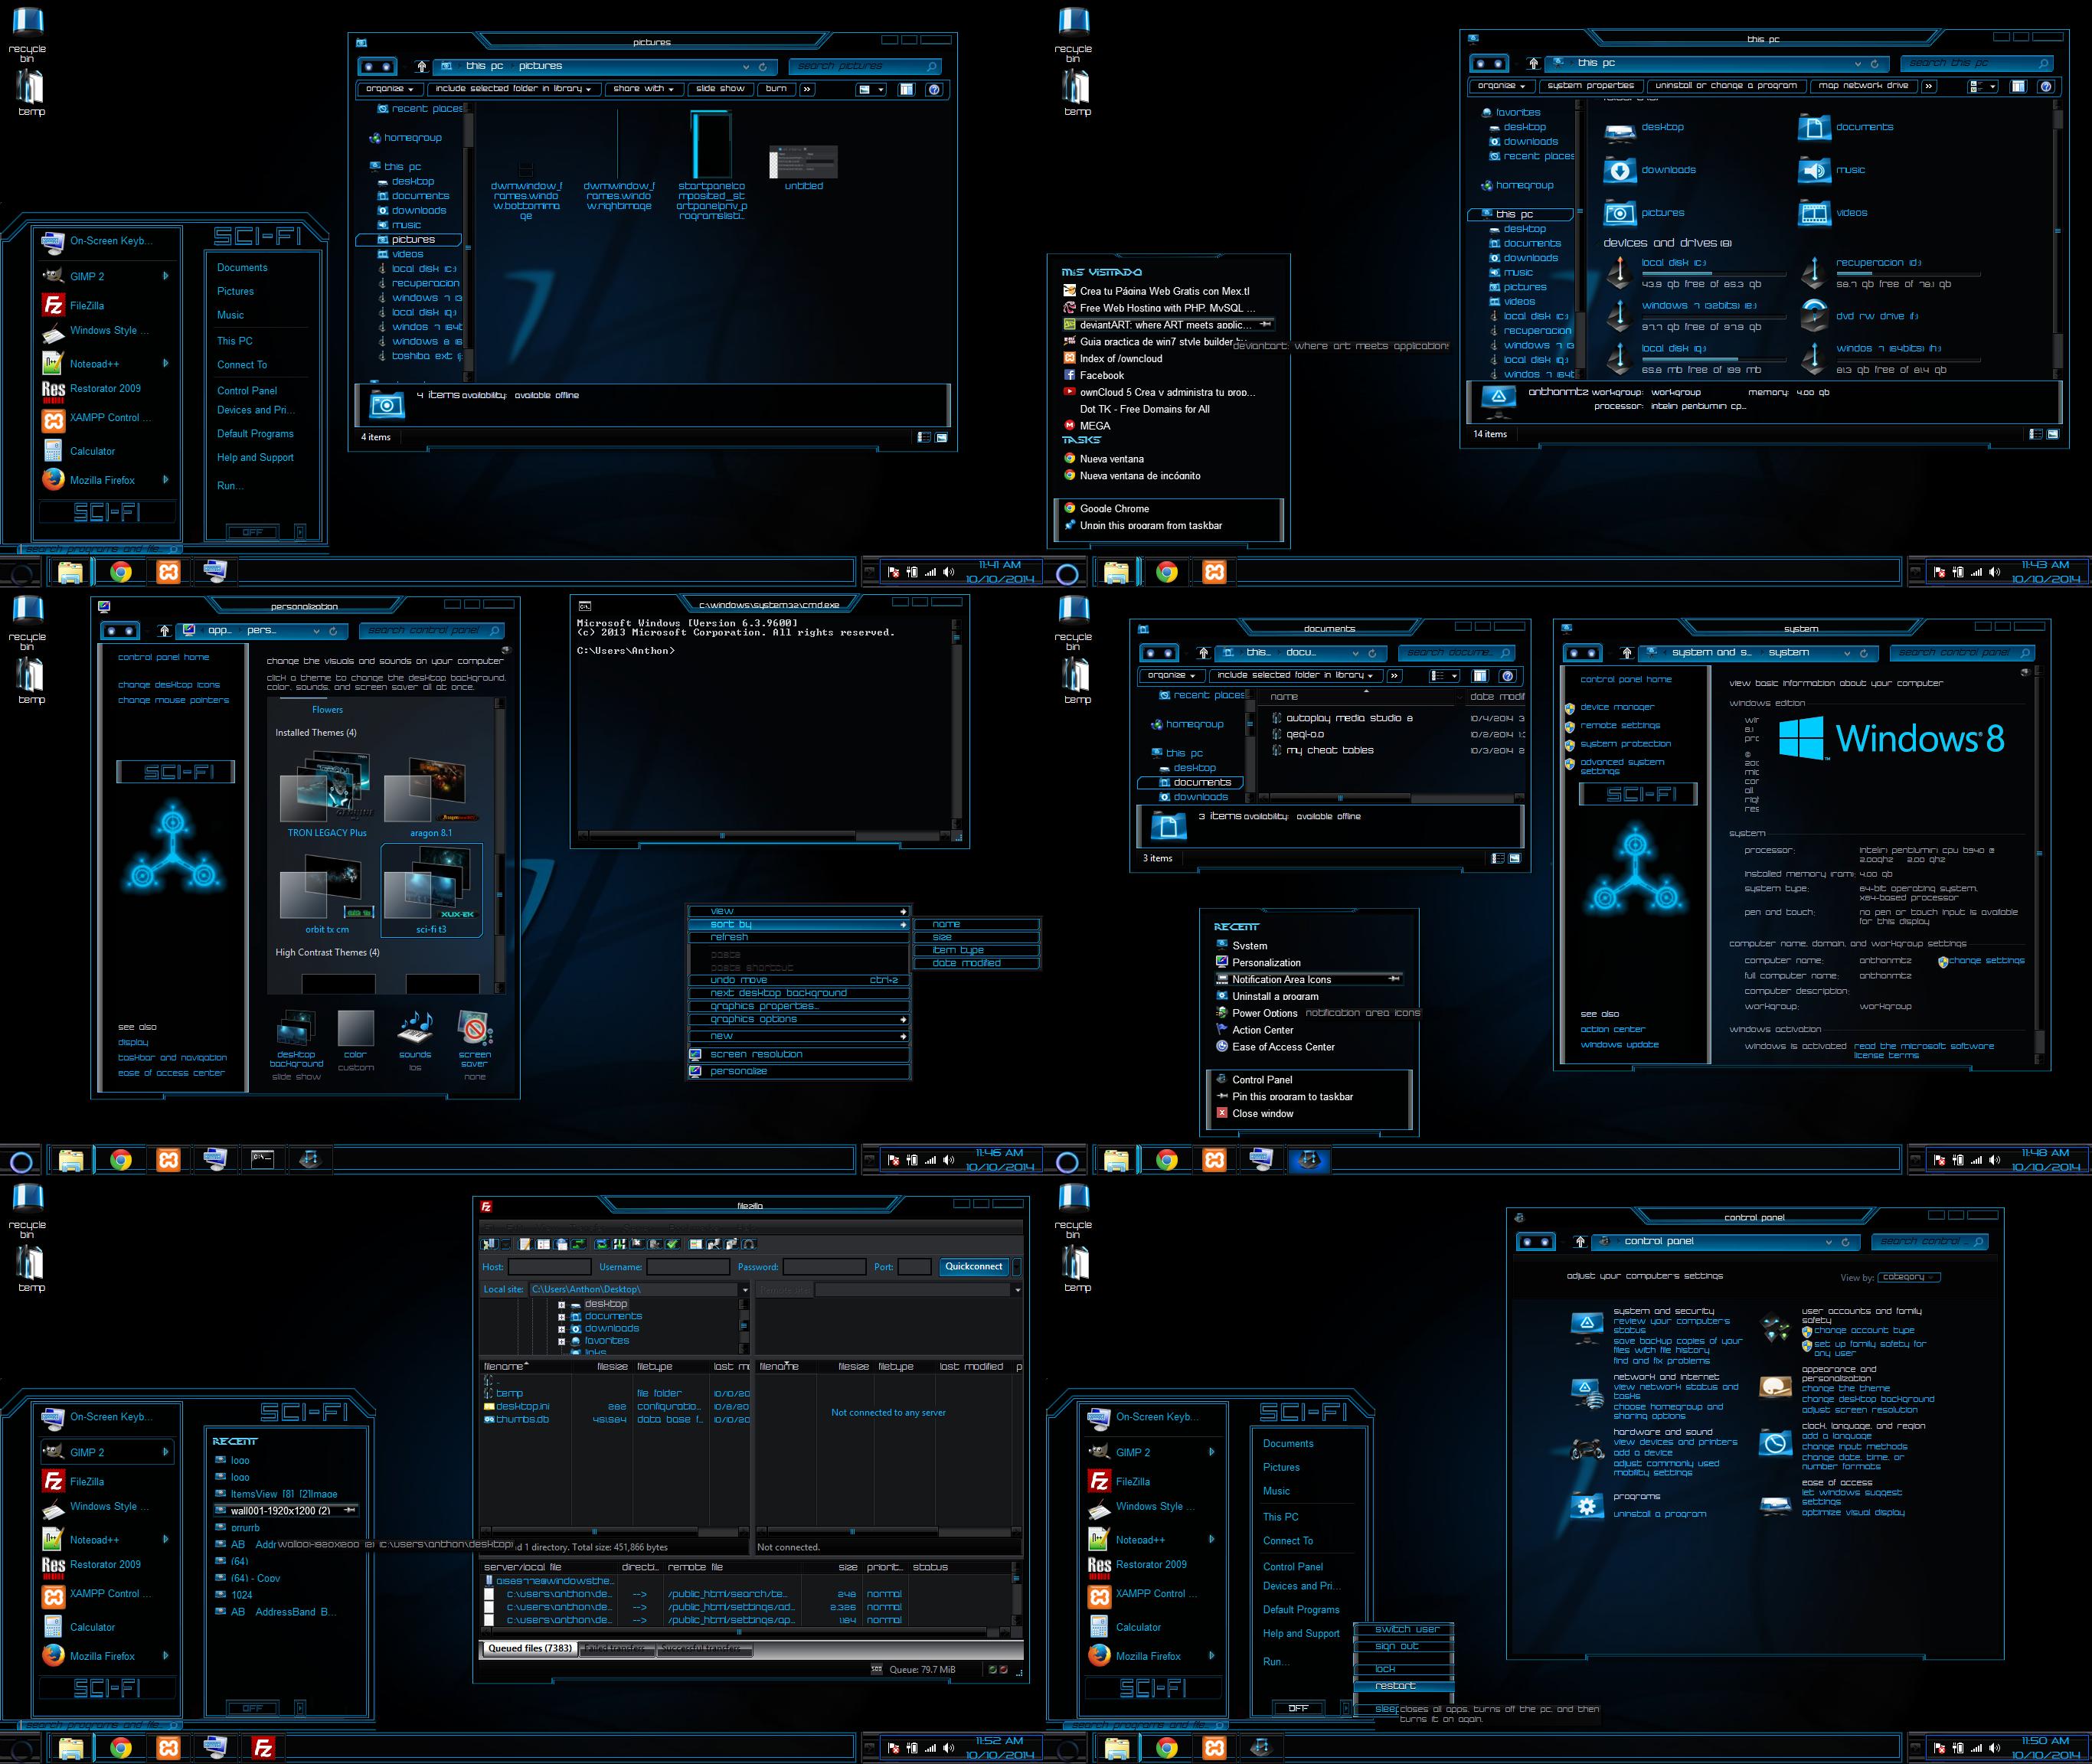 Jarvis iron man blue rainmeter theme free download